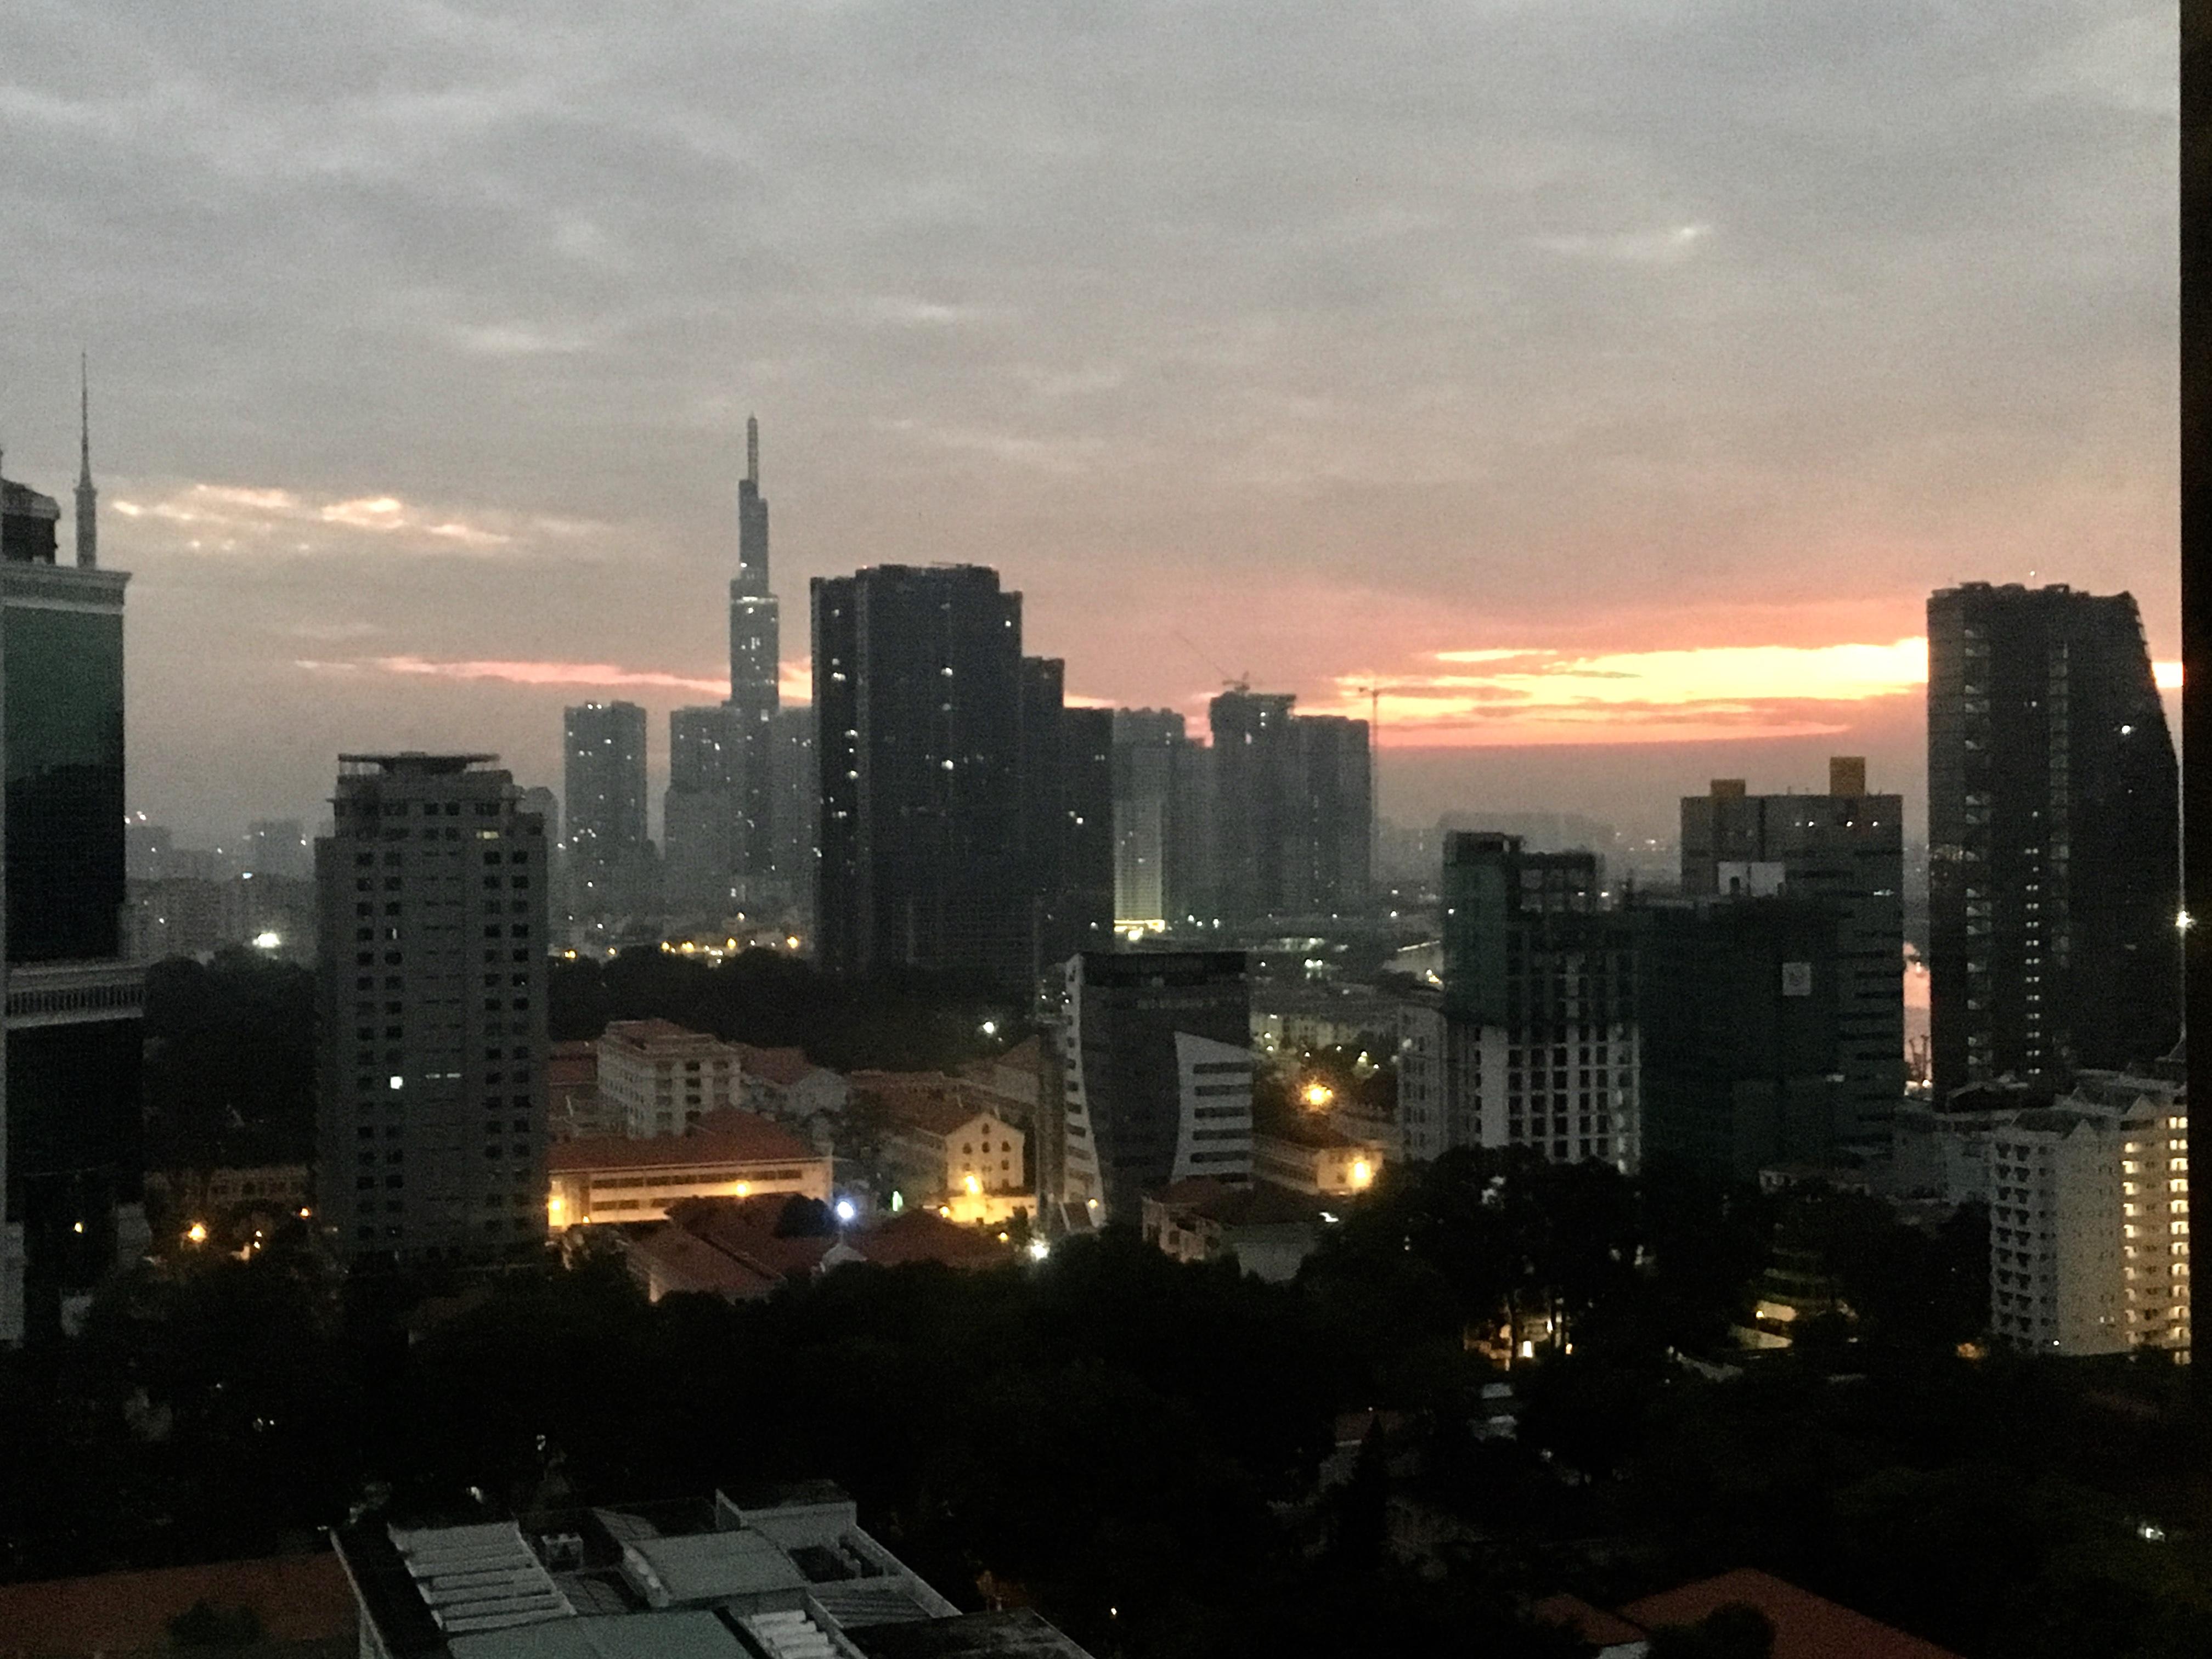 God Morning from Saigon